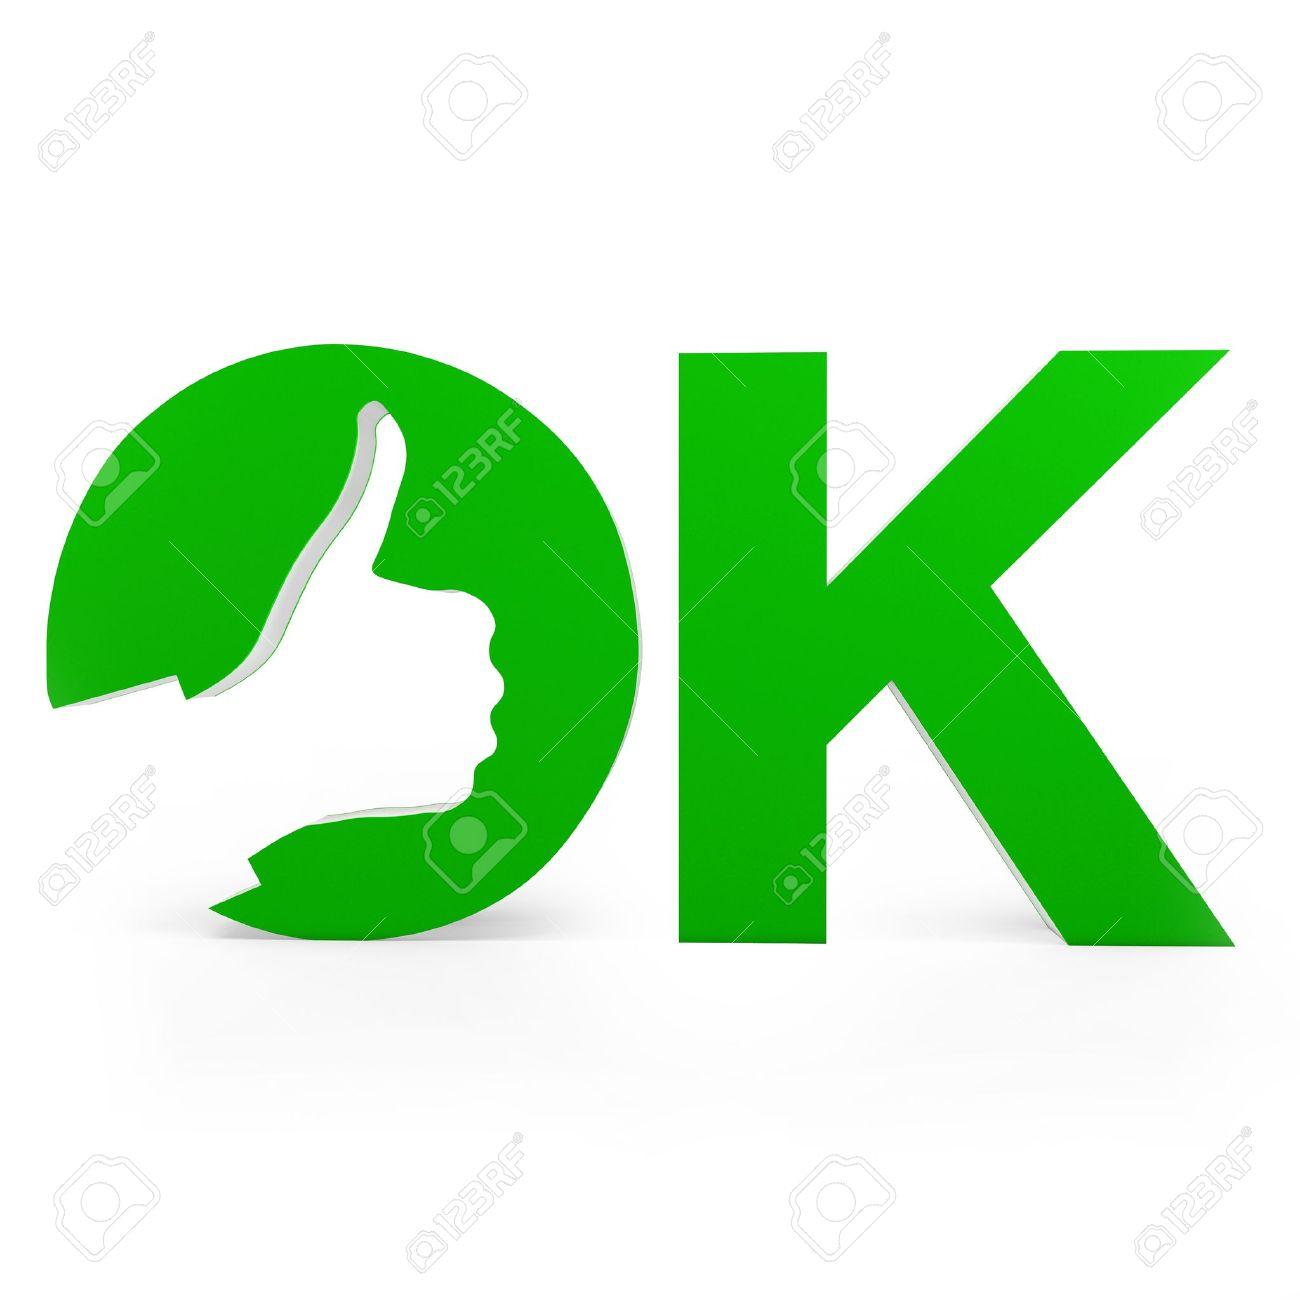 ok design 3d Ok Sign With Hand Design On White Background Stock Photo  ok design